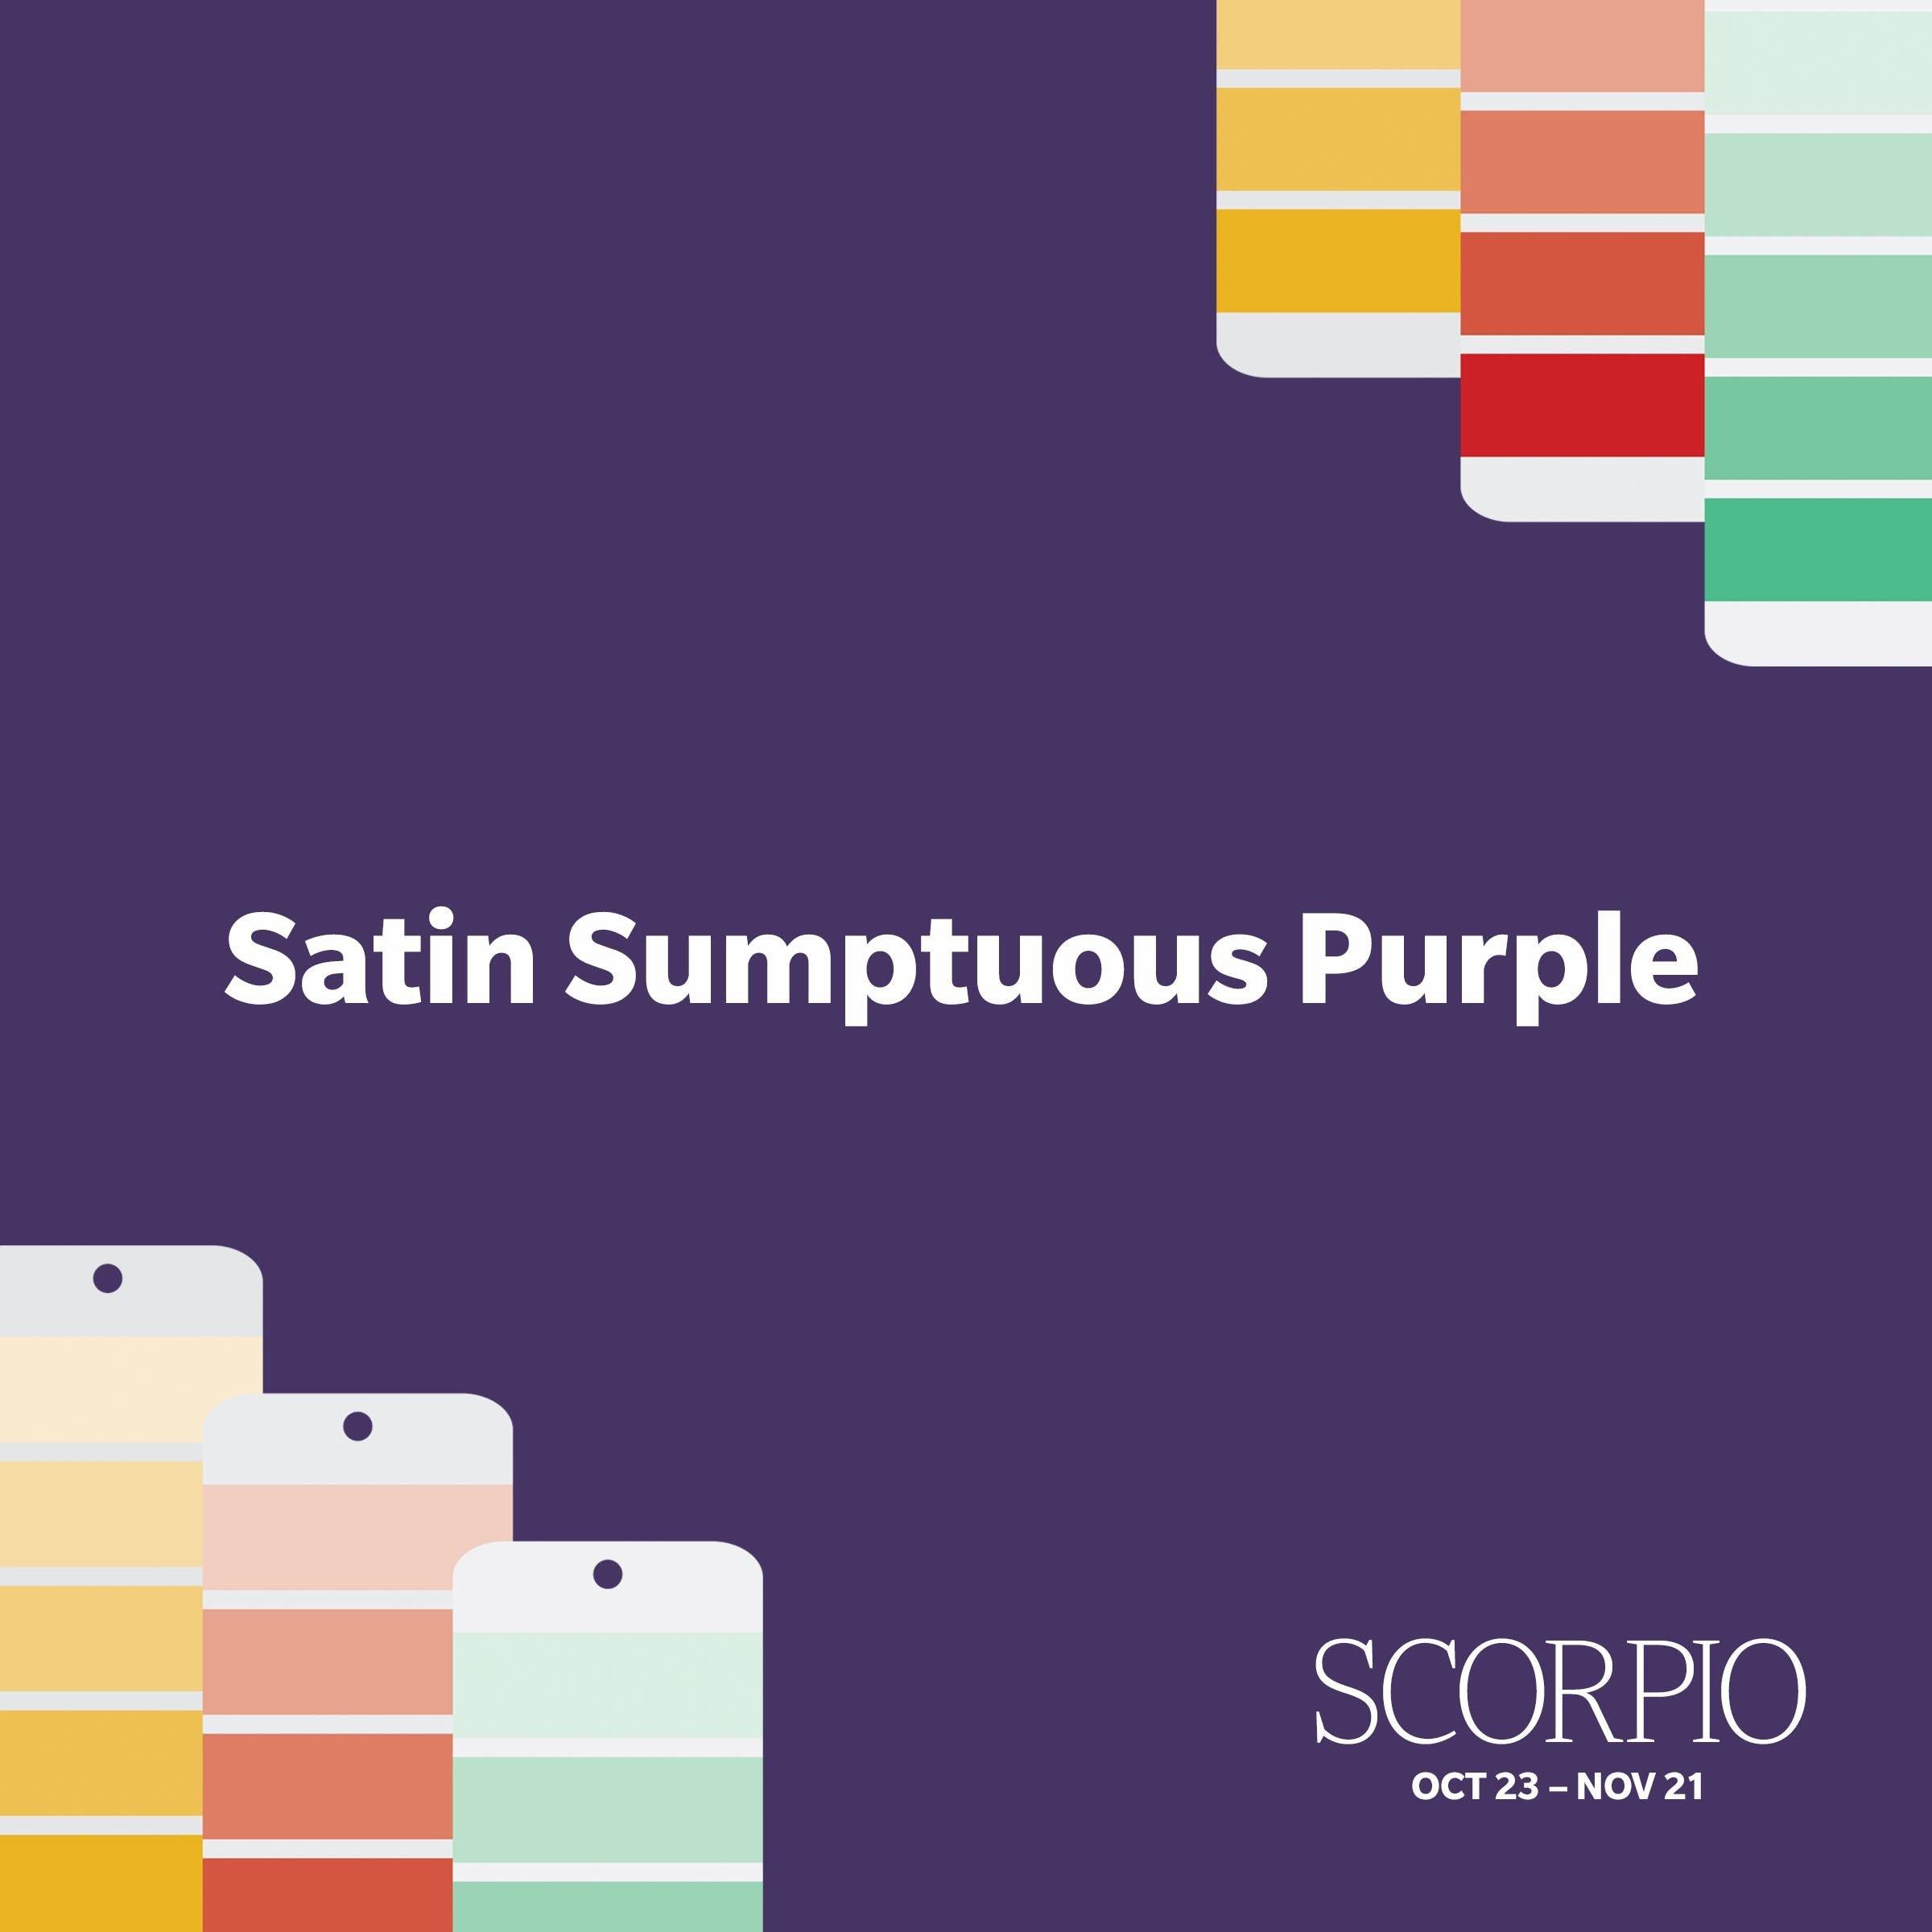 scorpio paint color